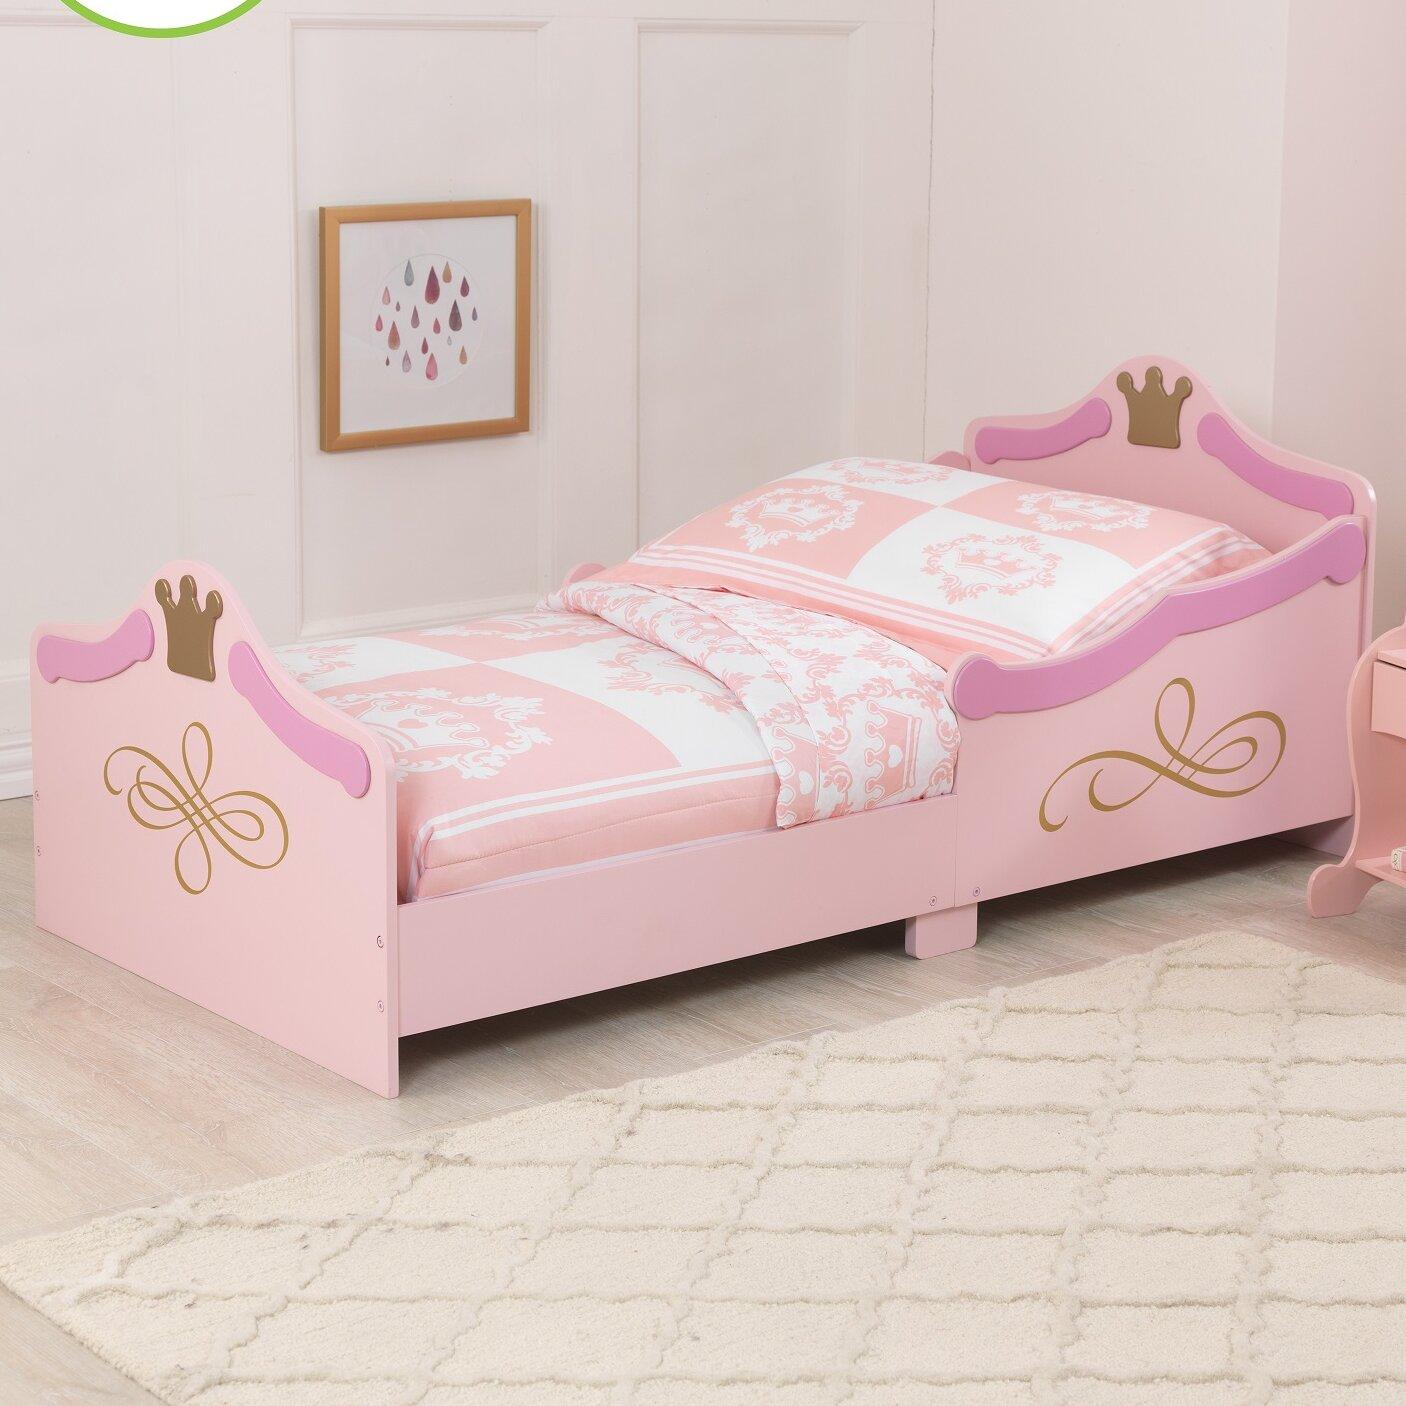 KidKraft Princess Convertible Toddler Bed Reviews